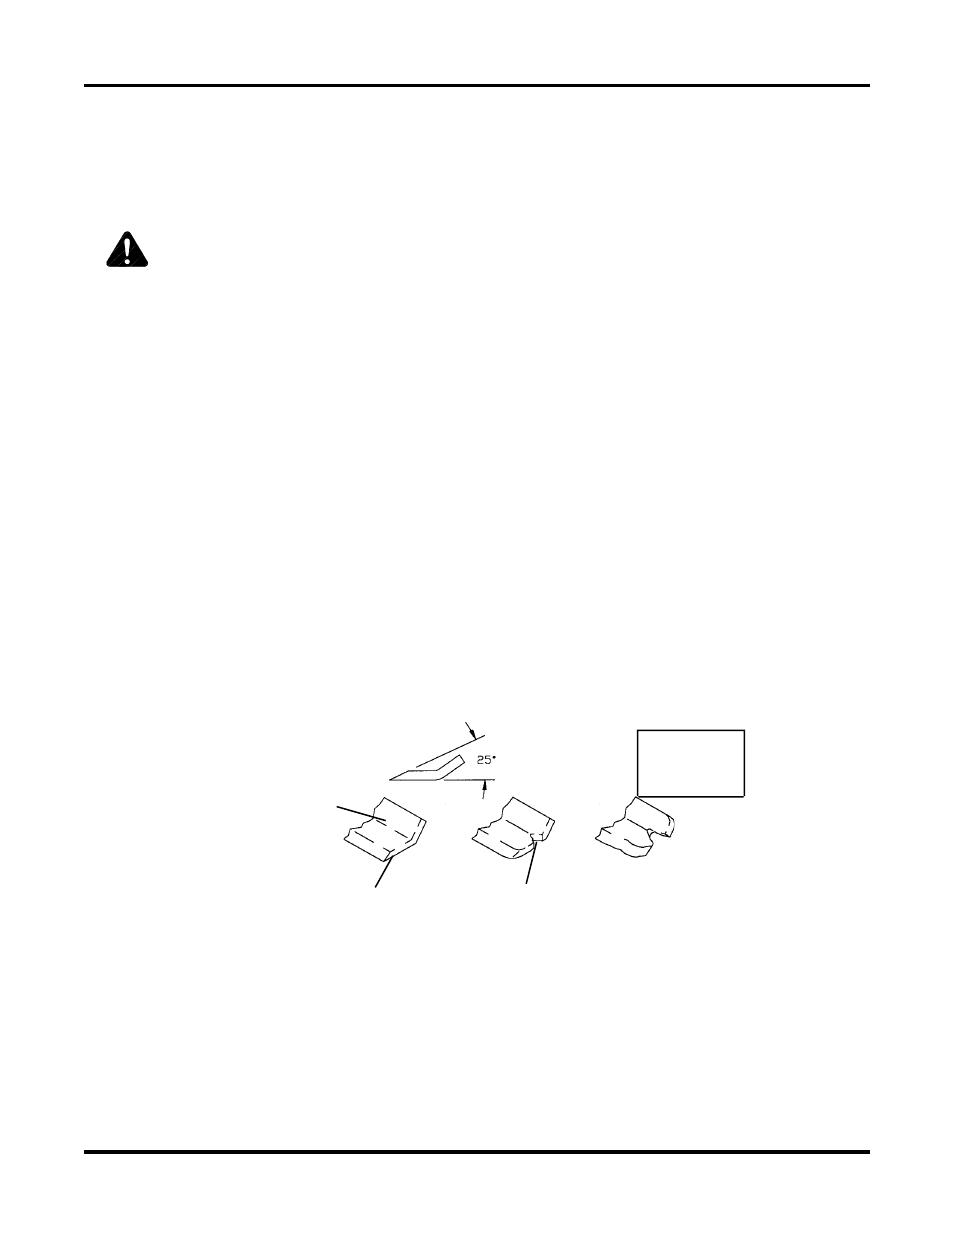 Care and maintenance, Mower blades, V-belts   Caution   Dixon ZTR 7025